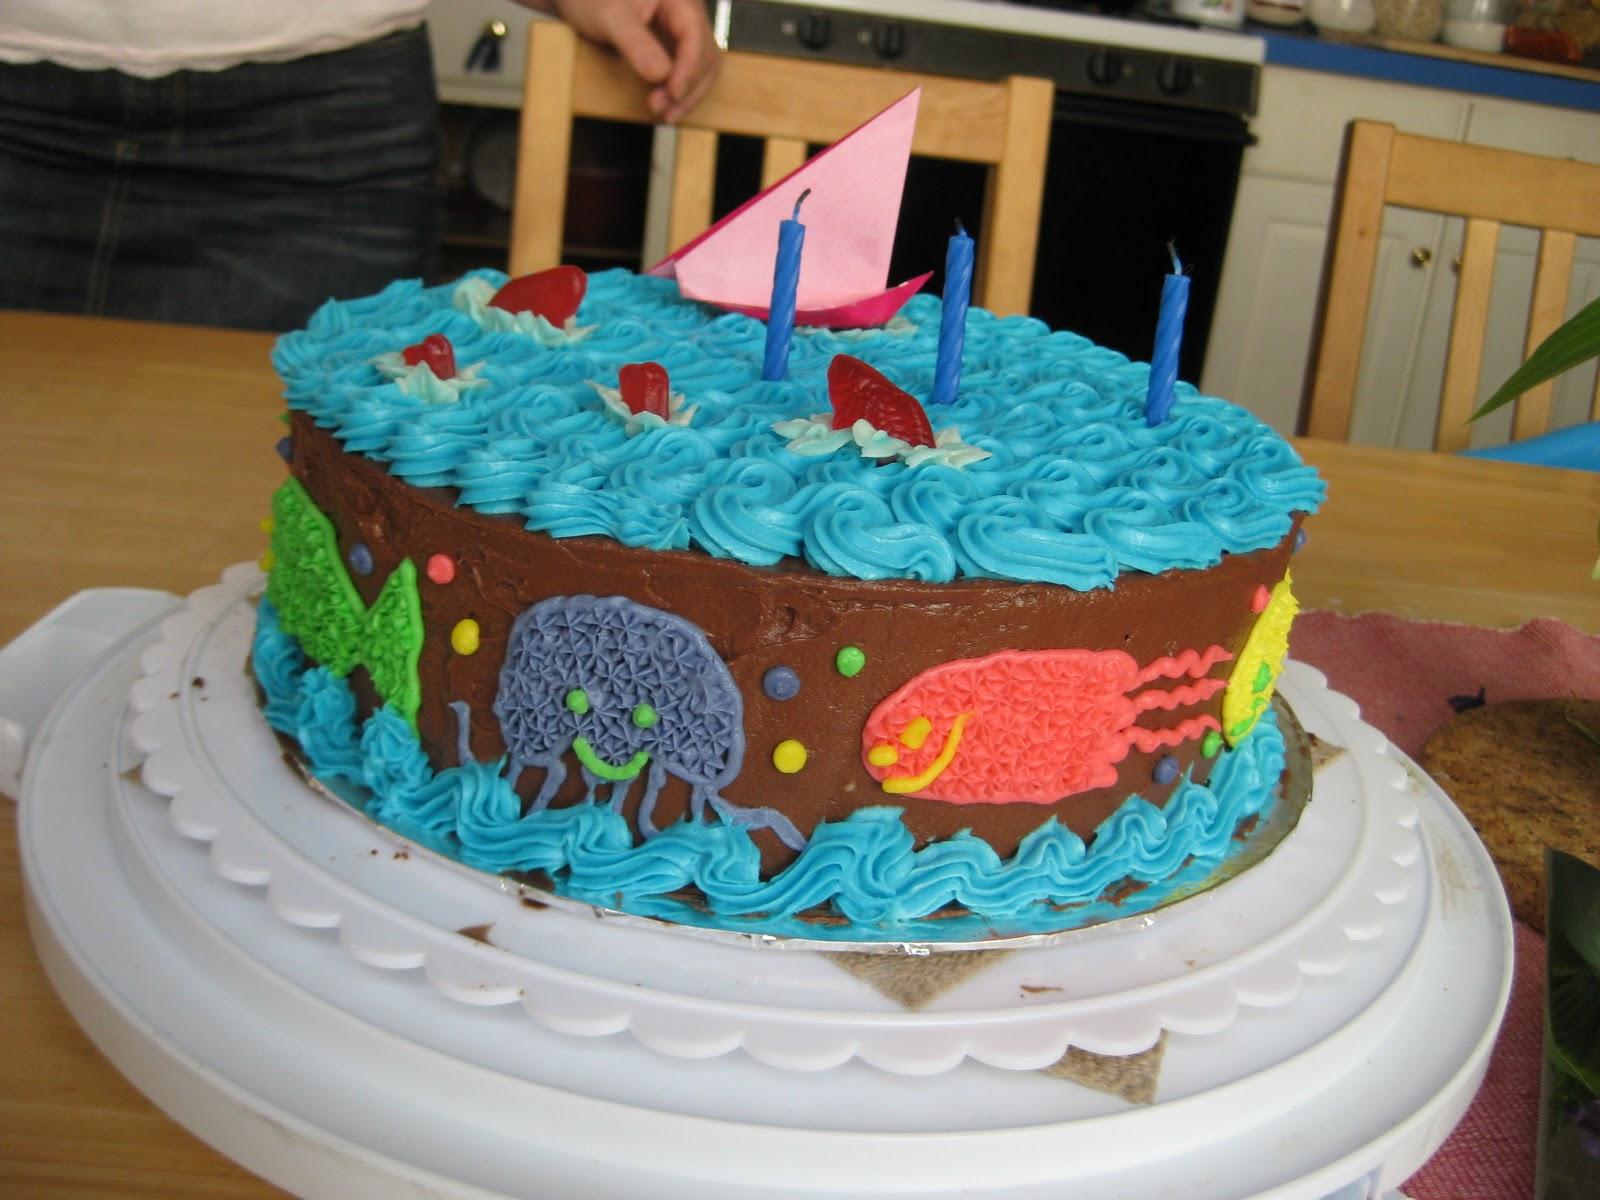 Birthday Cake For Little Sister ~ Cirsia fortuita: fishy birthday cake